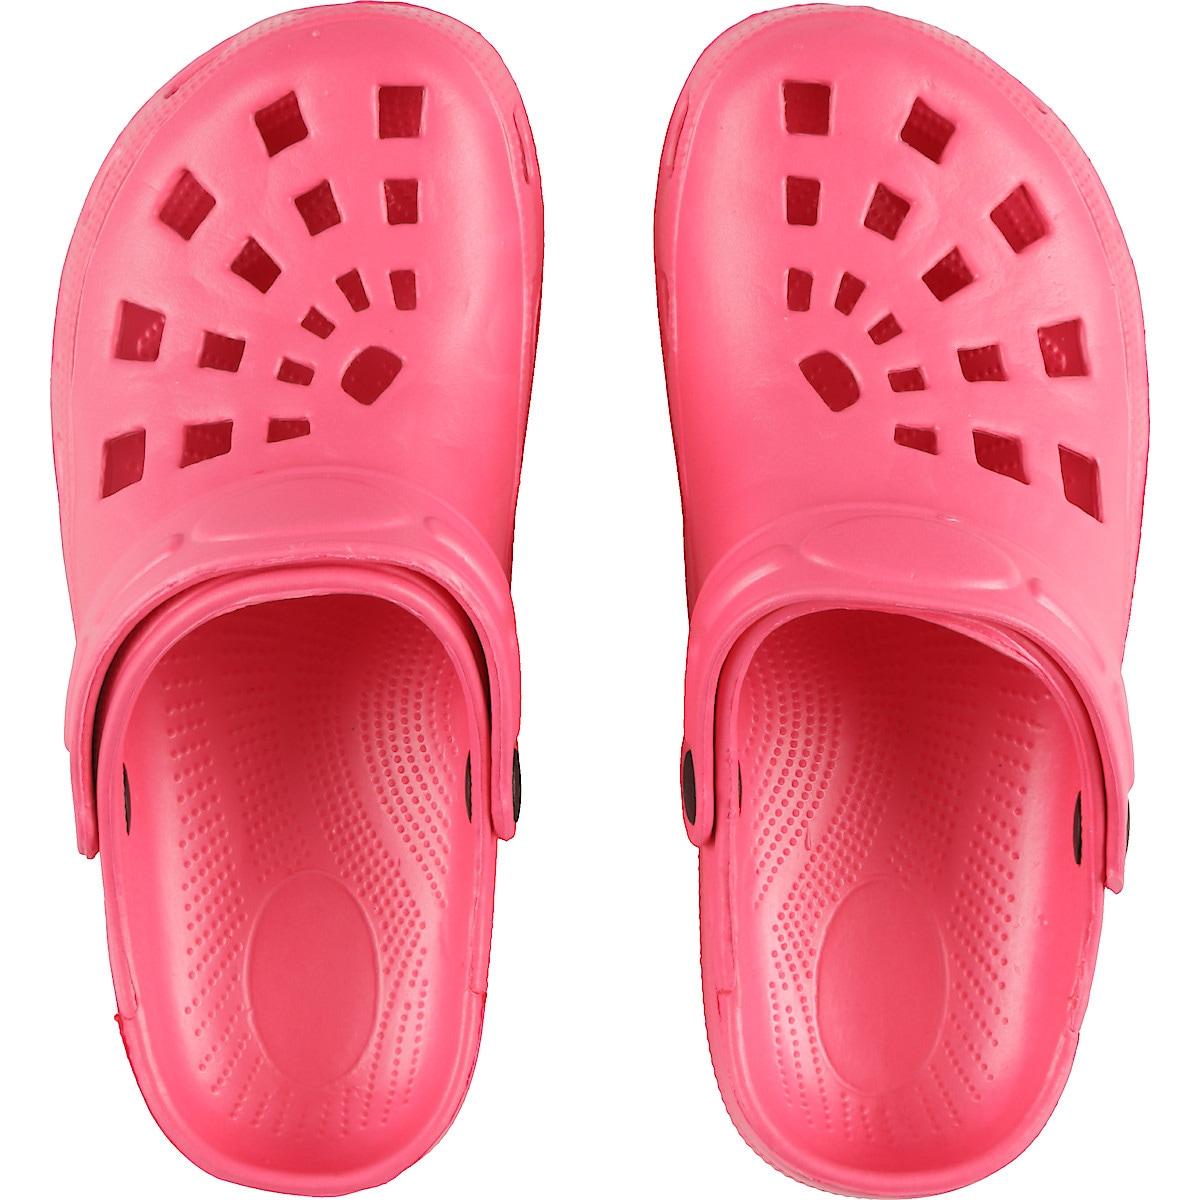 Kunststoffpantoffeln Damen, rosa